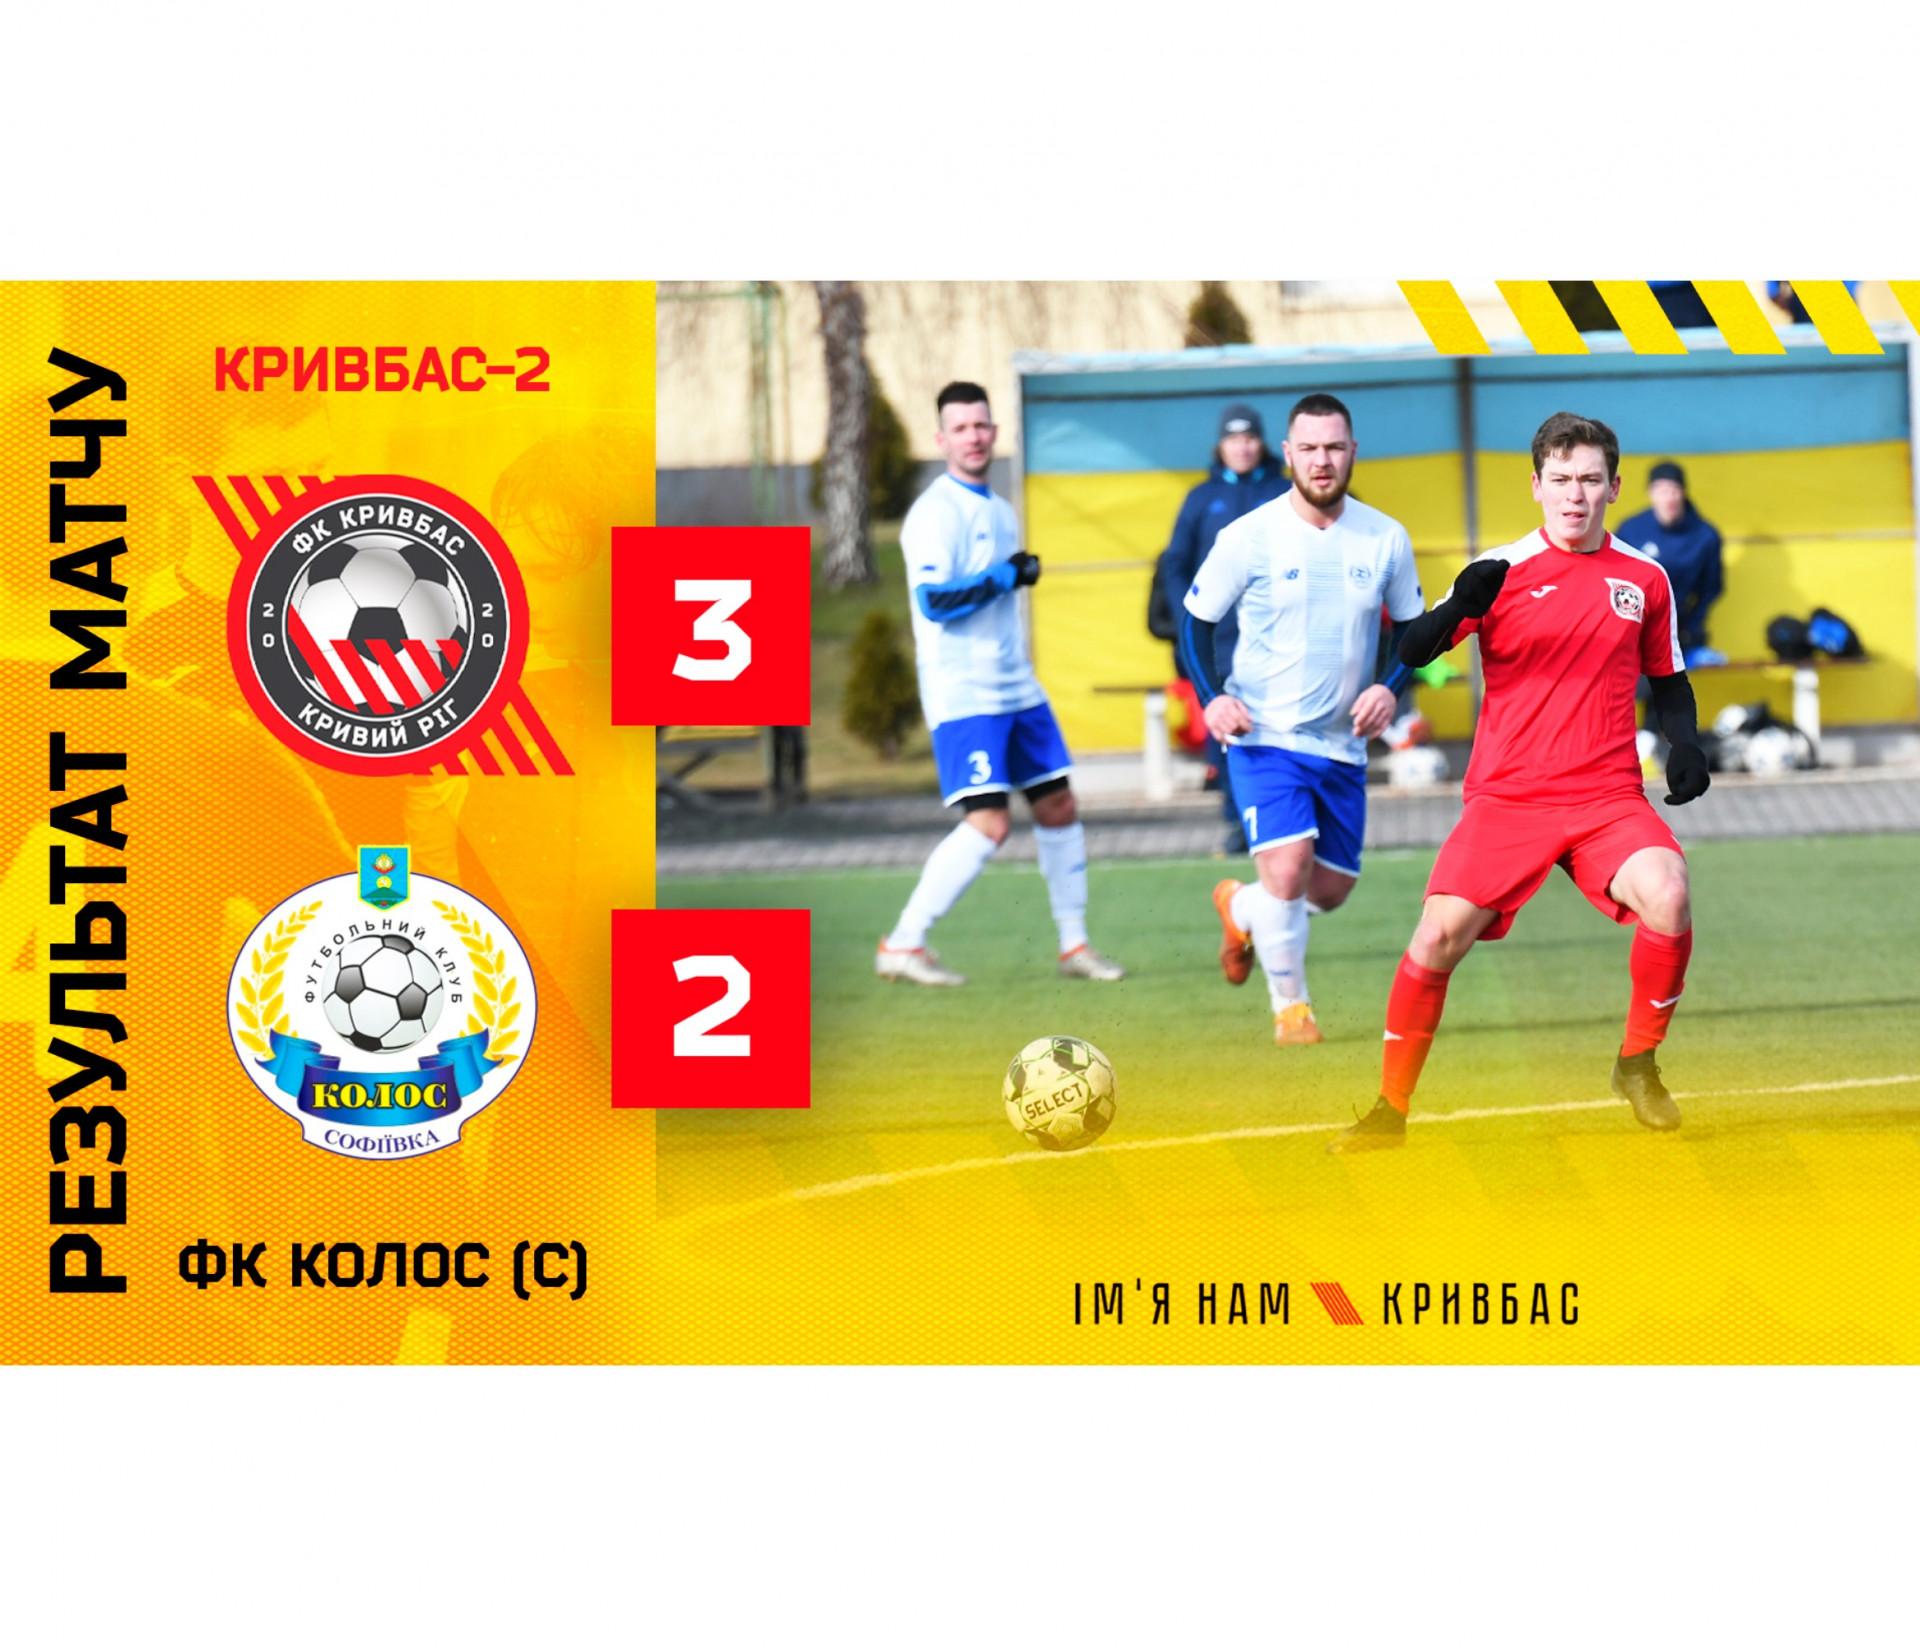 """Кривбас-2"" - ""Колос"" 3:2}"